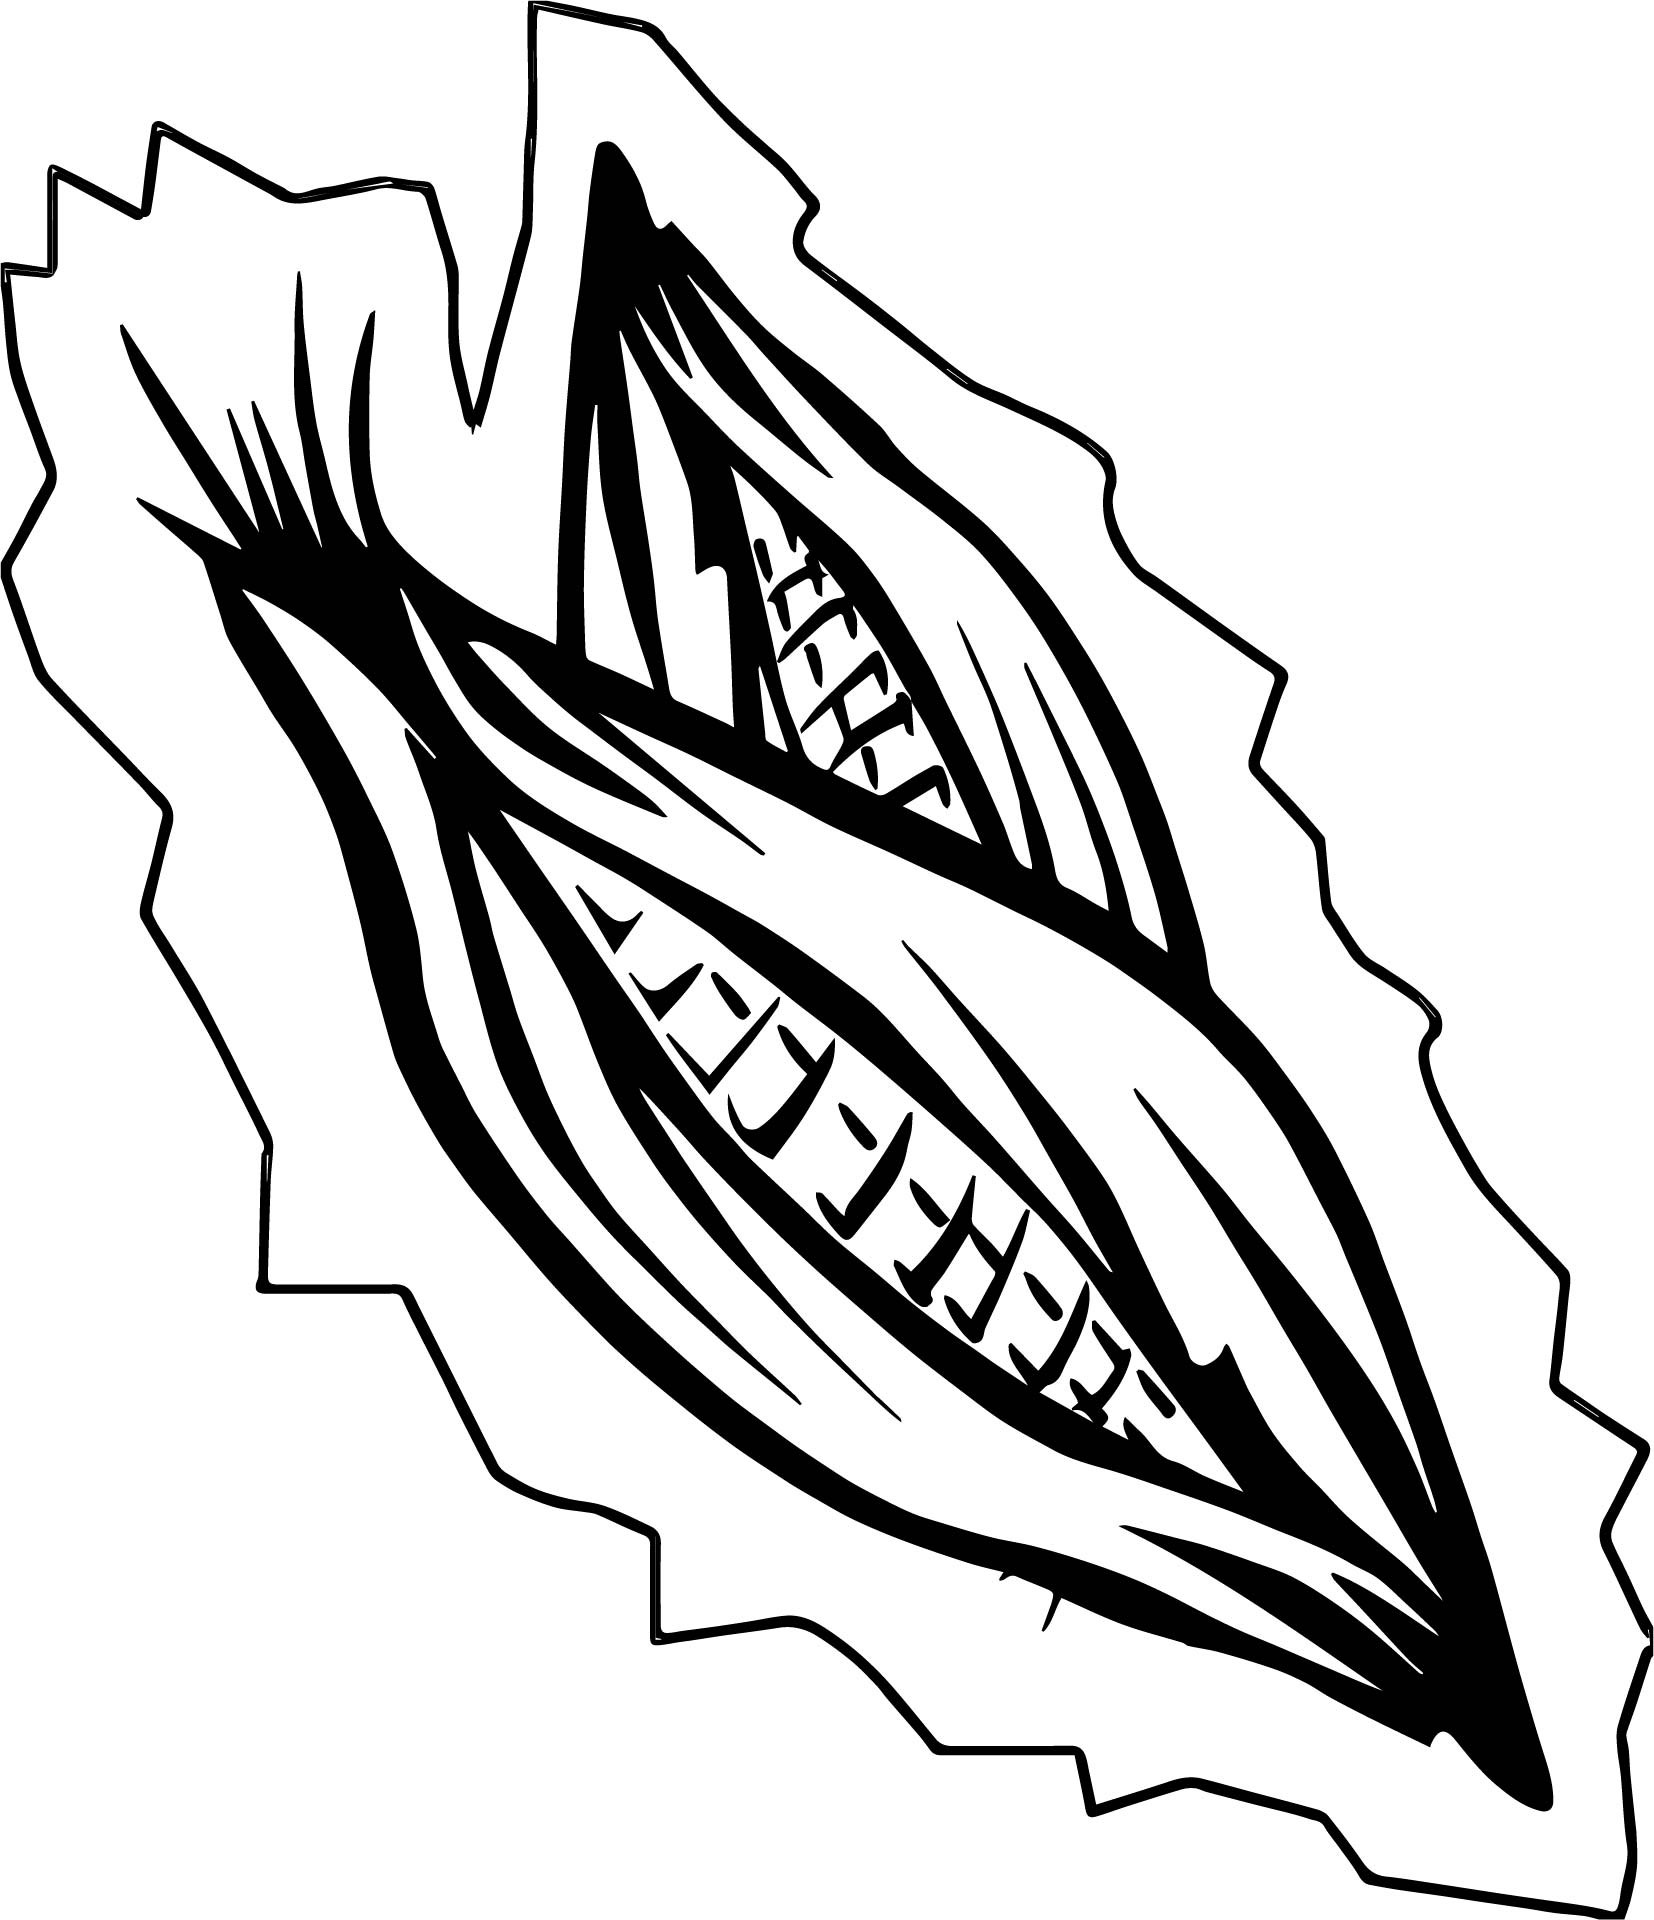 1654x1920 Corn Coloring Pages Excellent Impressive Clip Art Ear Of Page